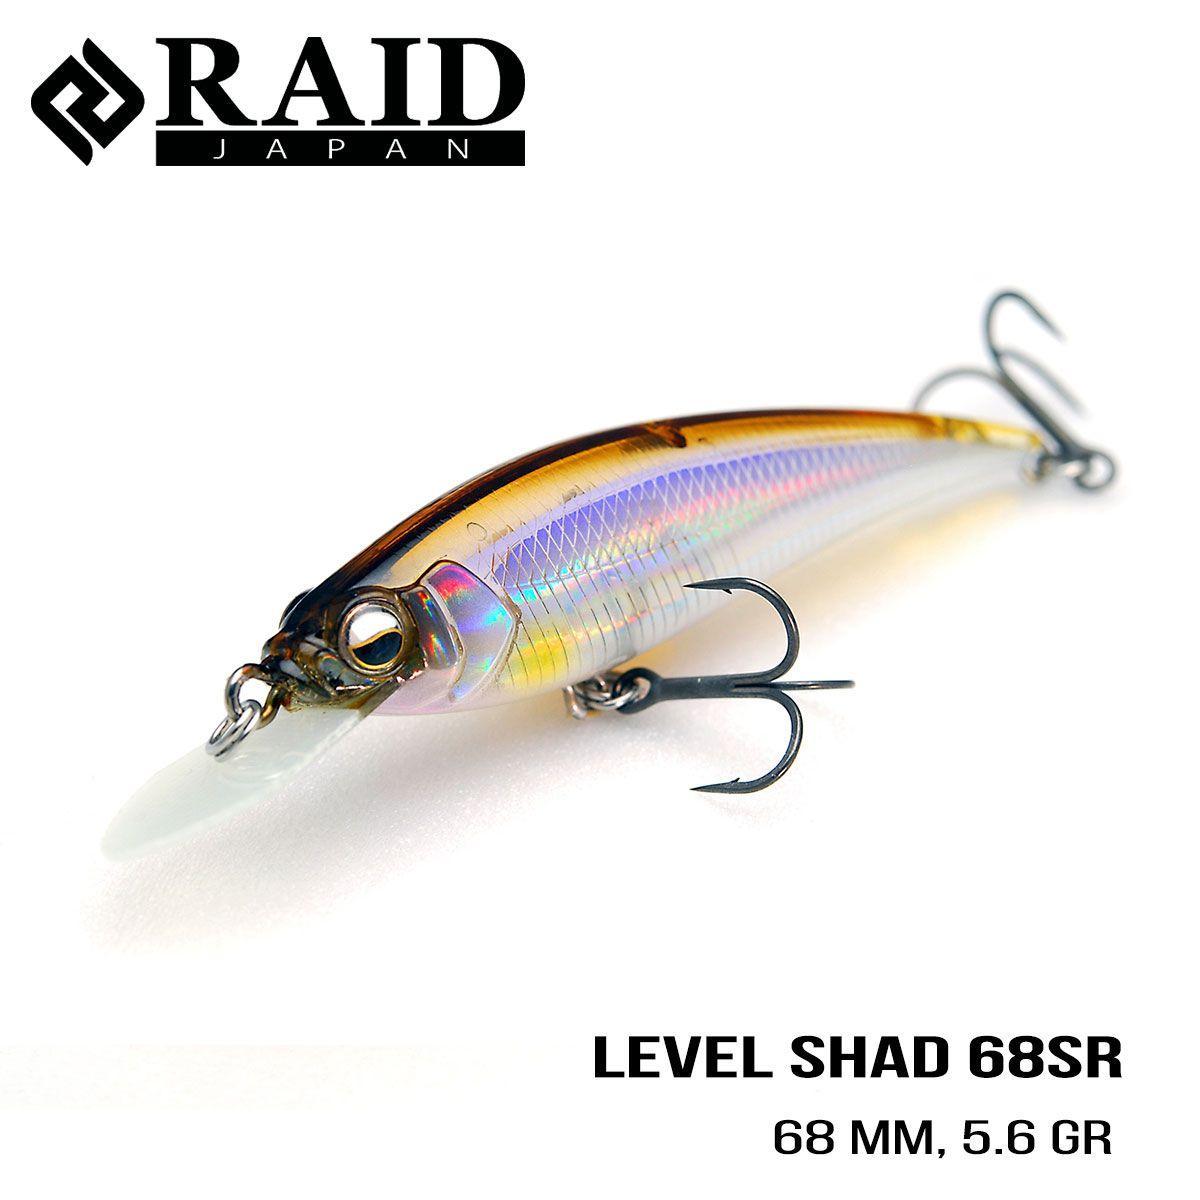 Воблер Raid Level Shad Sprinter 68SR (68mm, 5.6g) (005 Kanamoroco)